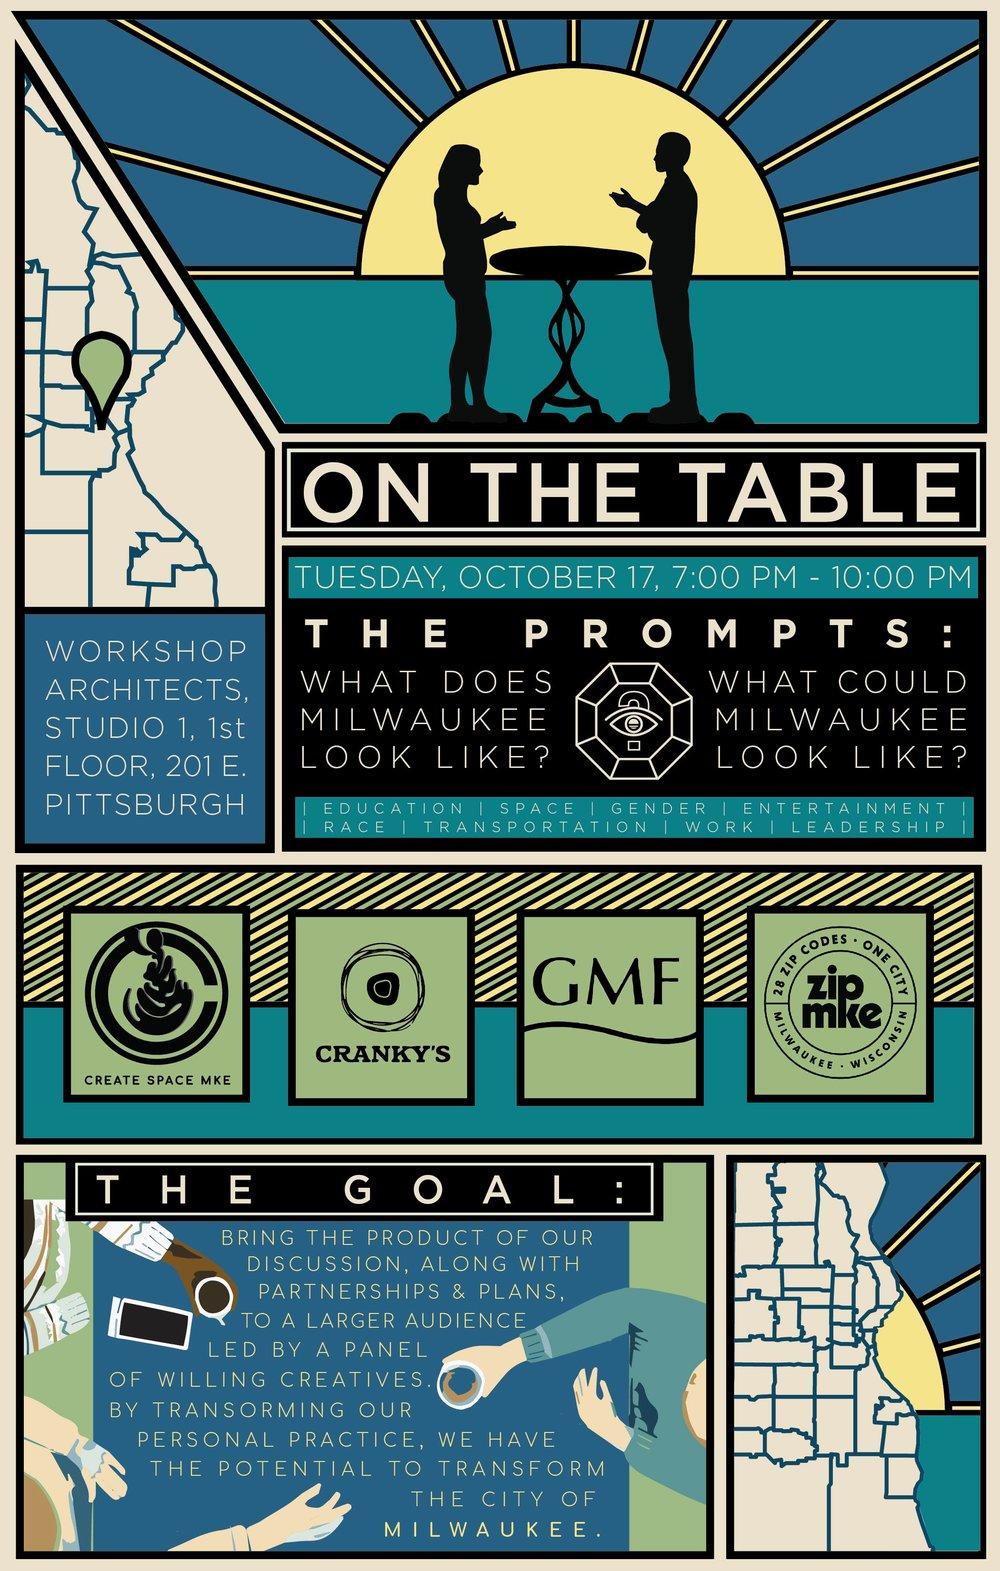 ON THE TABLE final-01.jpg